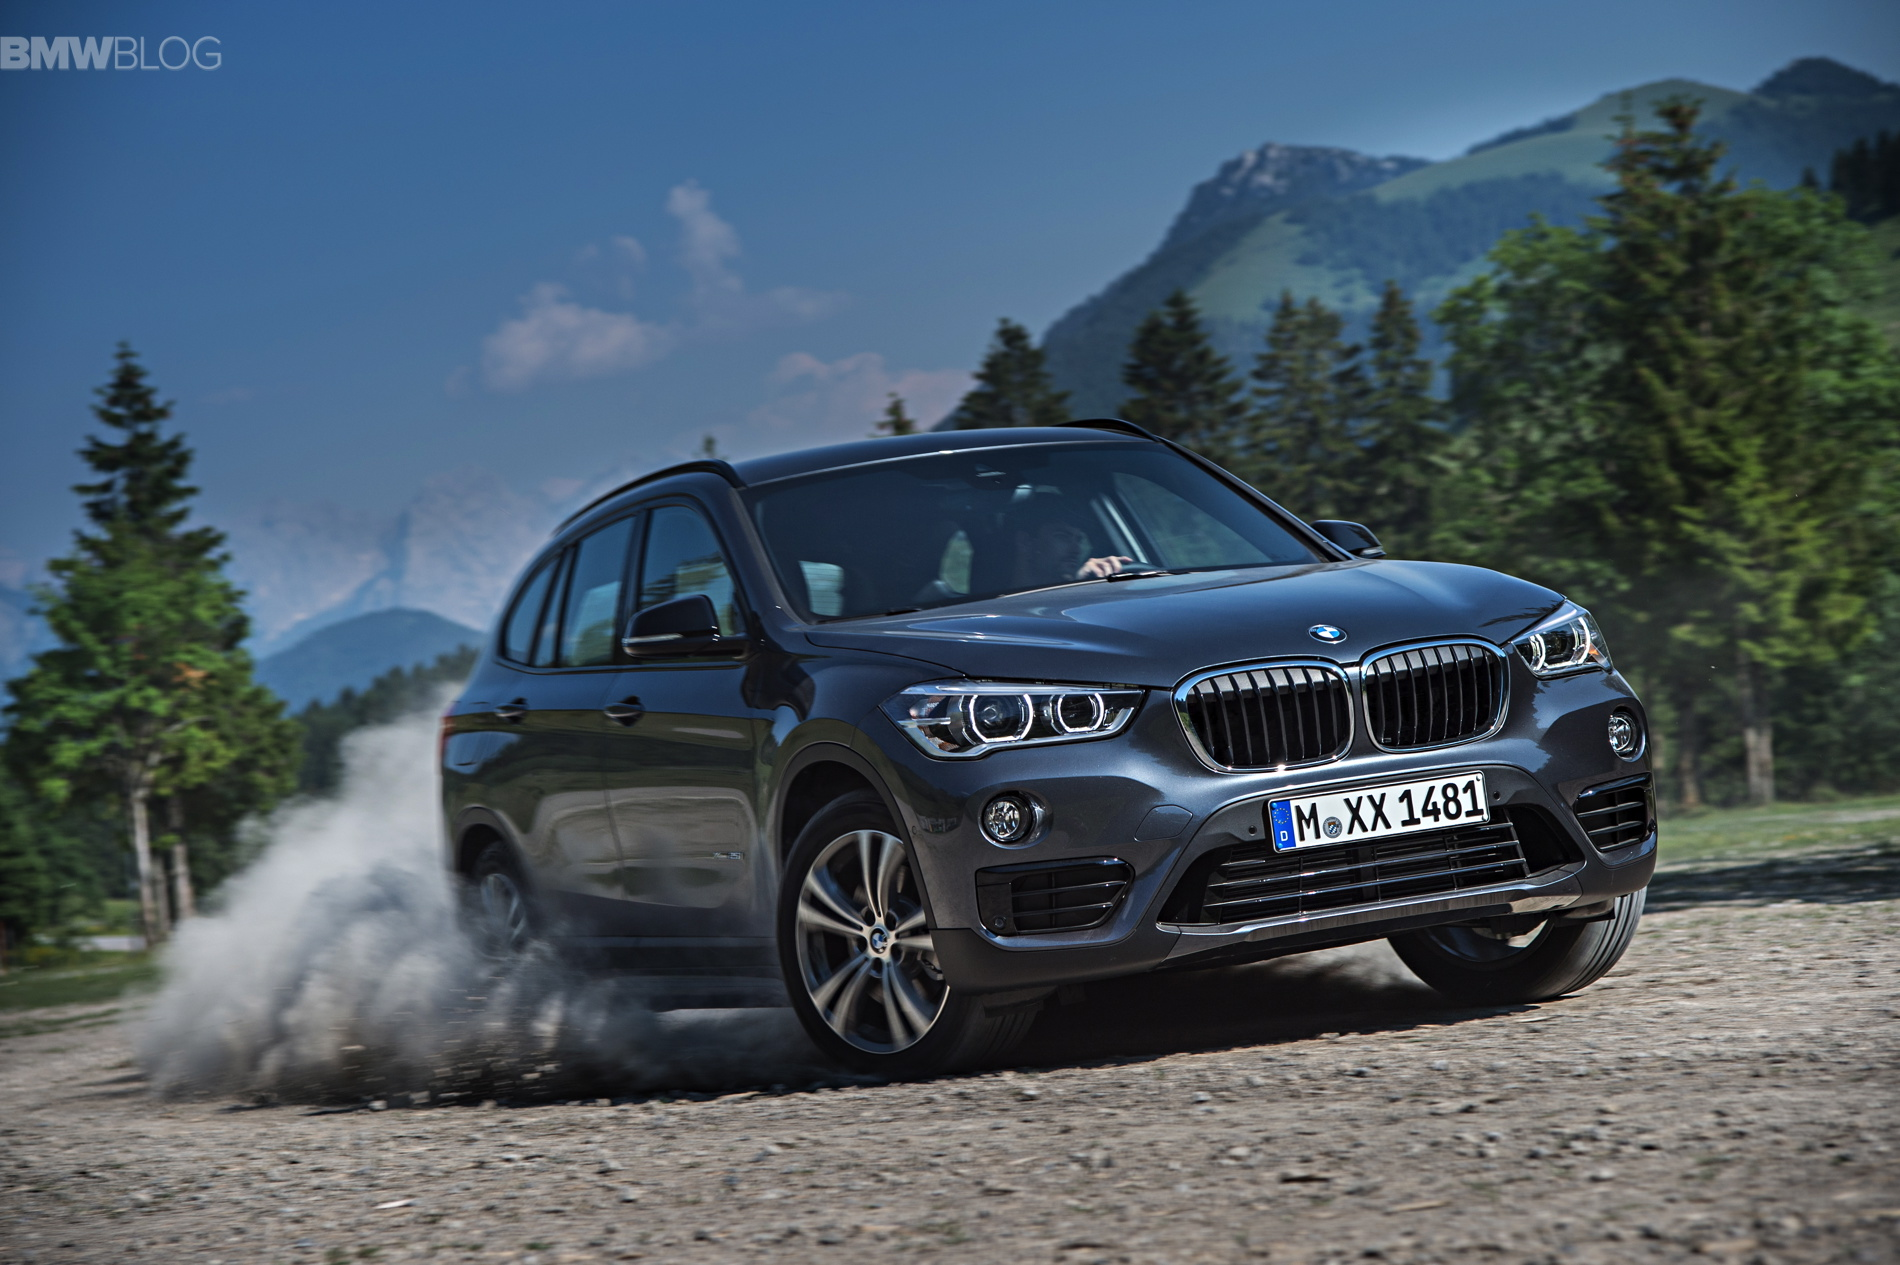 New BMW X1 exterior 1900x1200 images 14